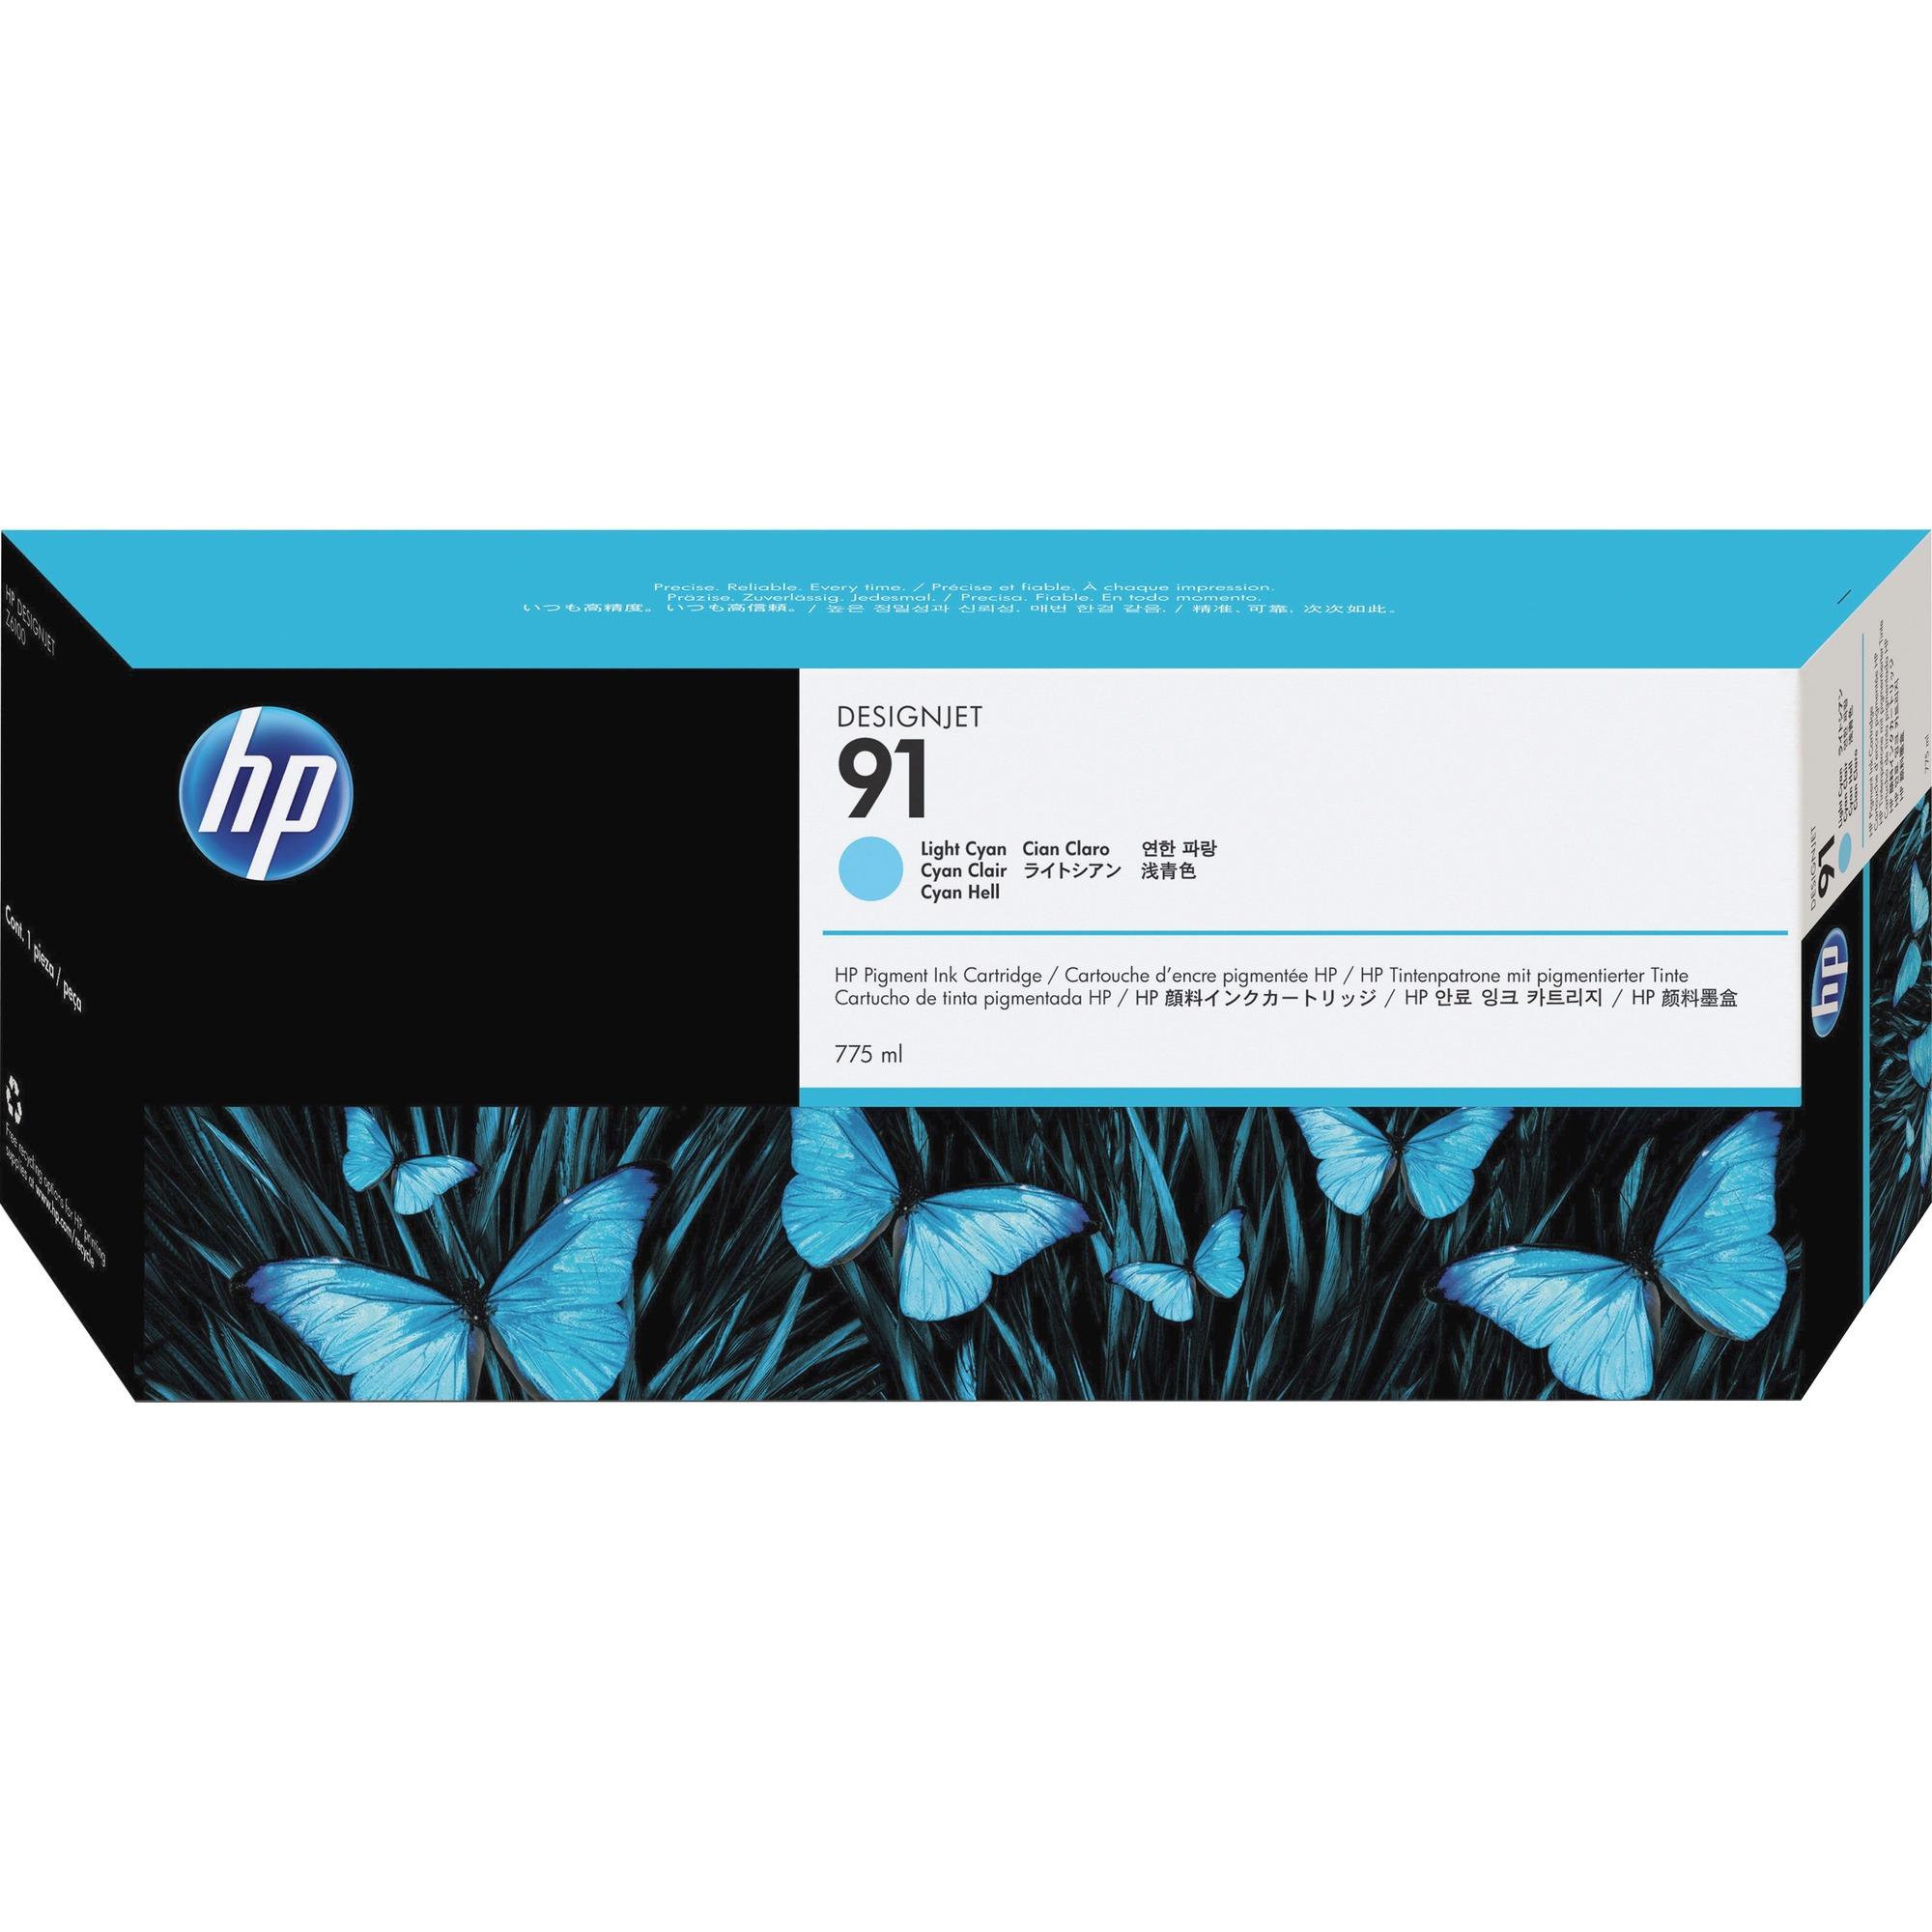 HP No. 91 Ink Cartridge - Light Cyan - C9470A